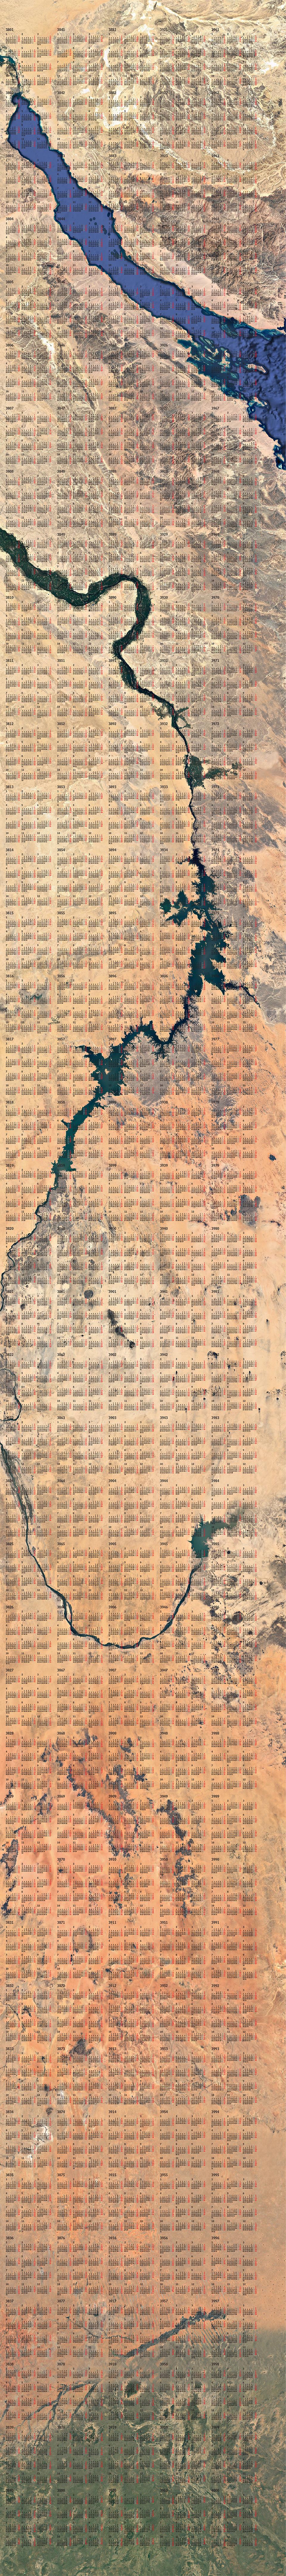 20210204_UNF0LD_CALENDAR_0001y-4000y_Sahara_Desert_2980x1480mm_Right.jpg